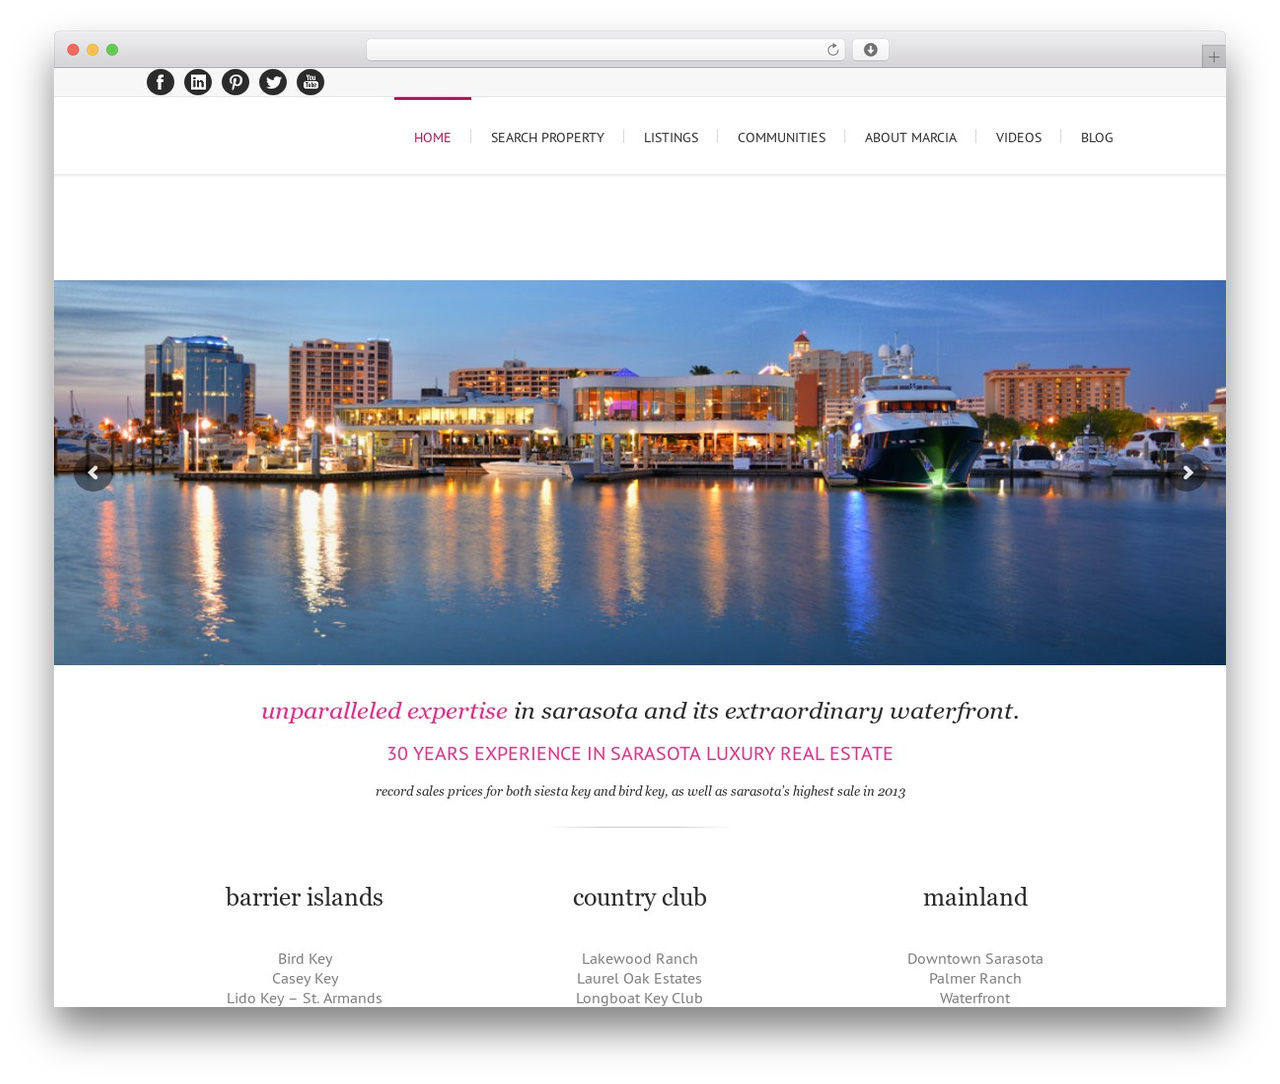 Lounge best real estate website - luxuryrealestateinsarasota.com